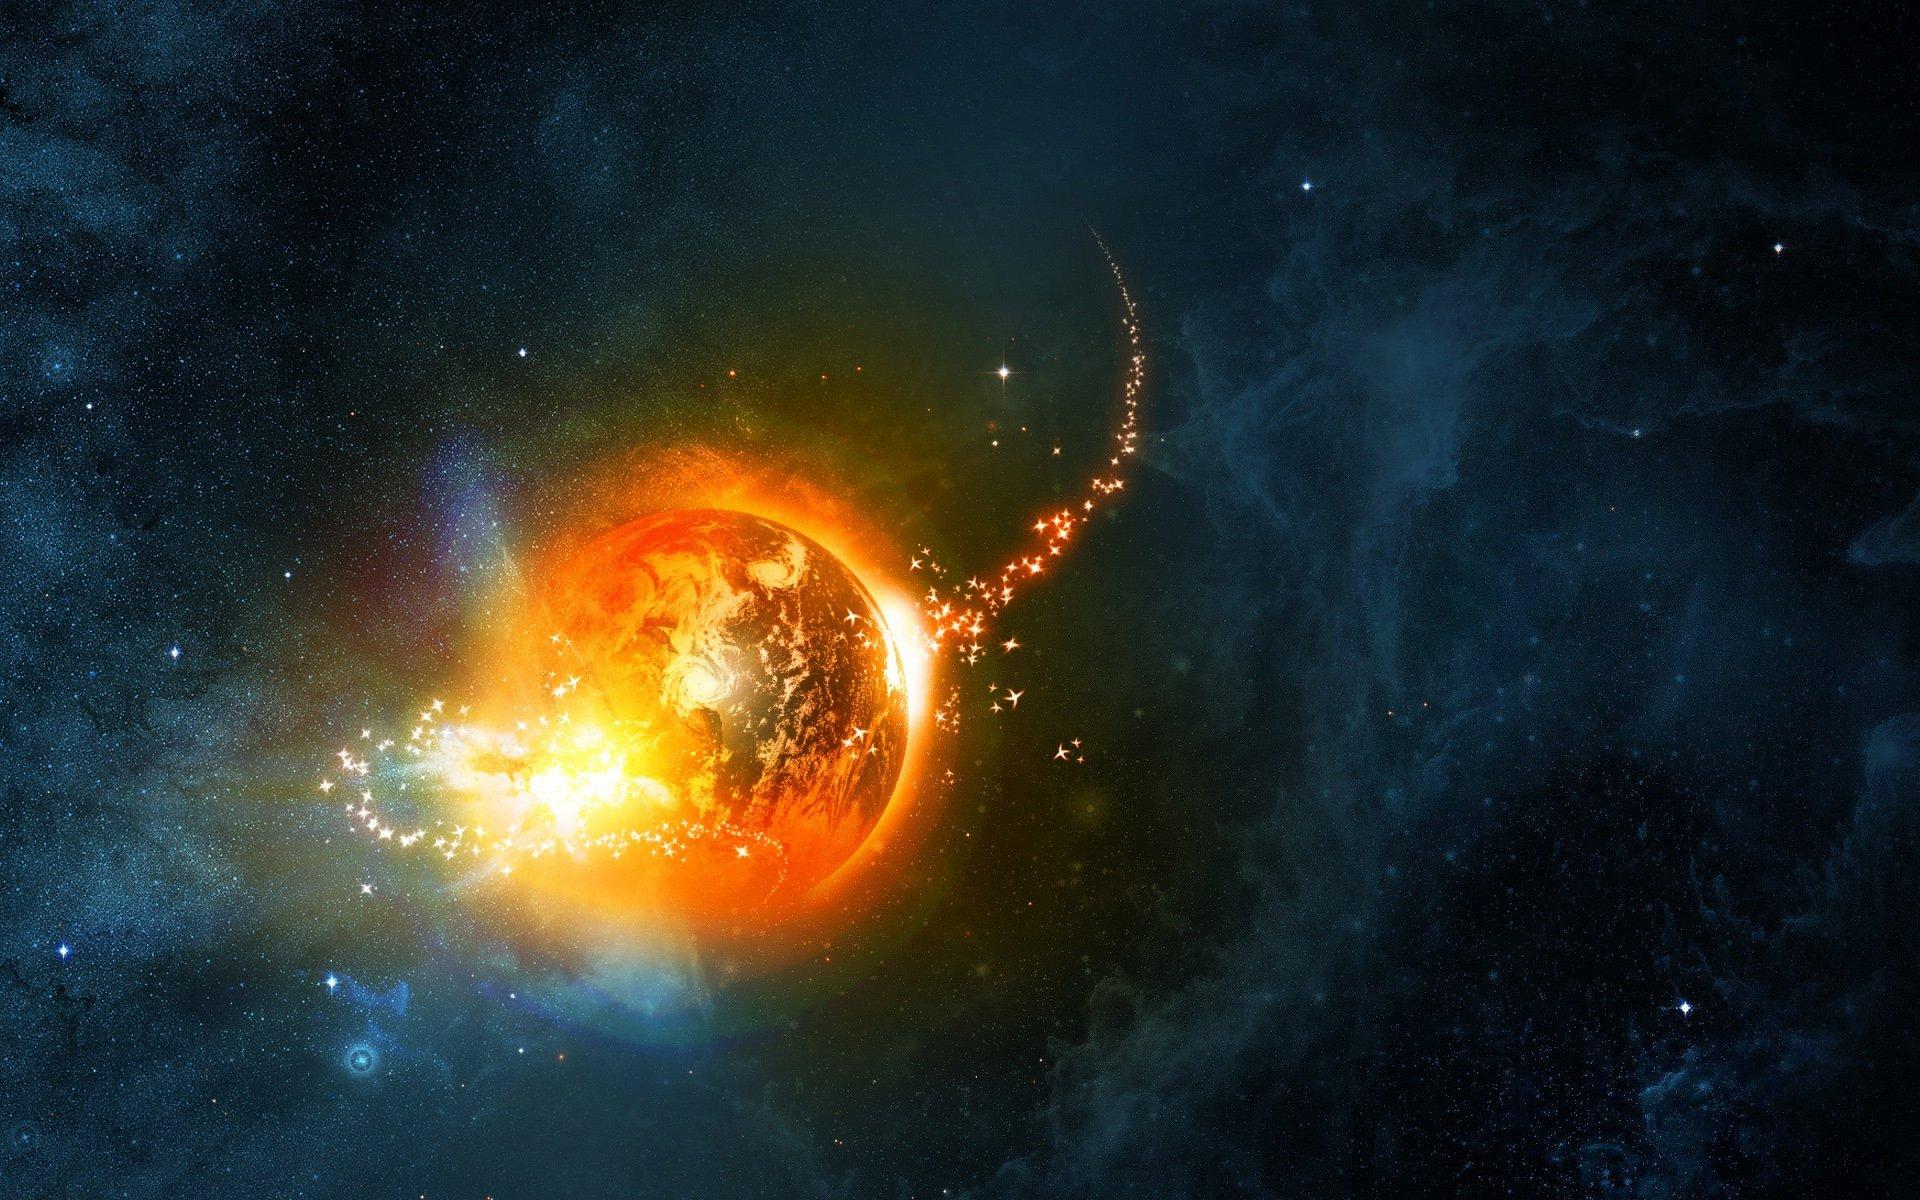 sun black star planetary anomaly vortex alignments - HD1920×1200